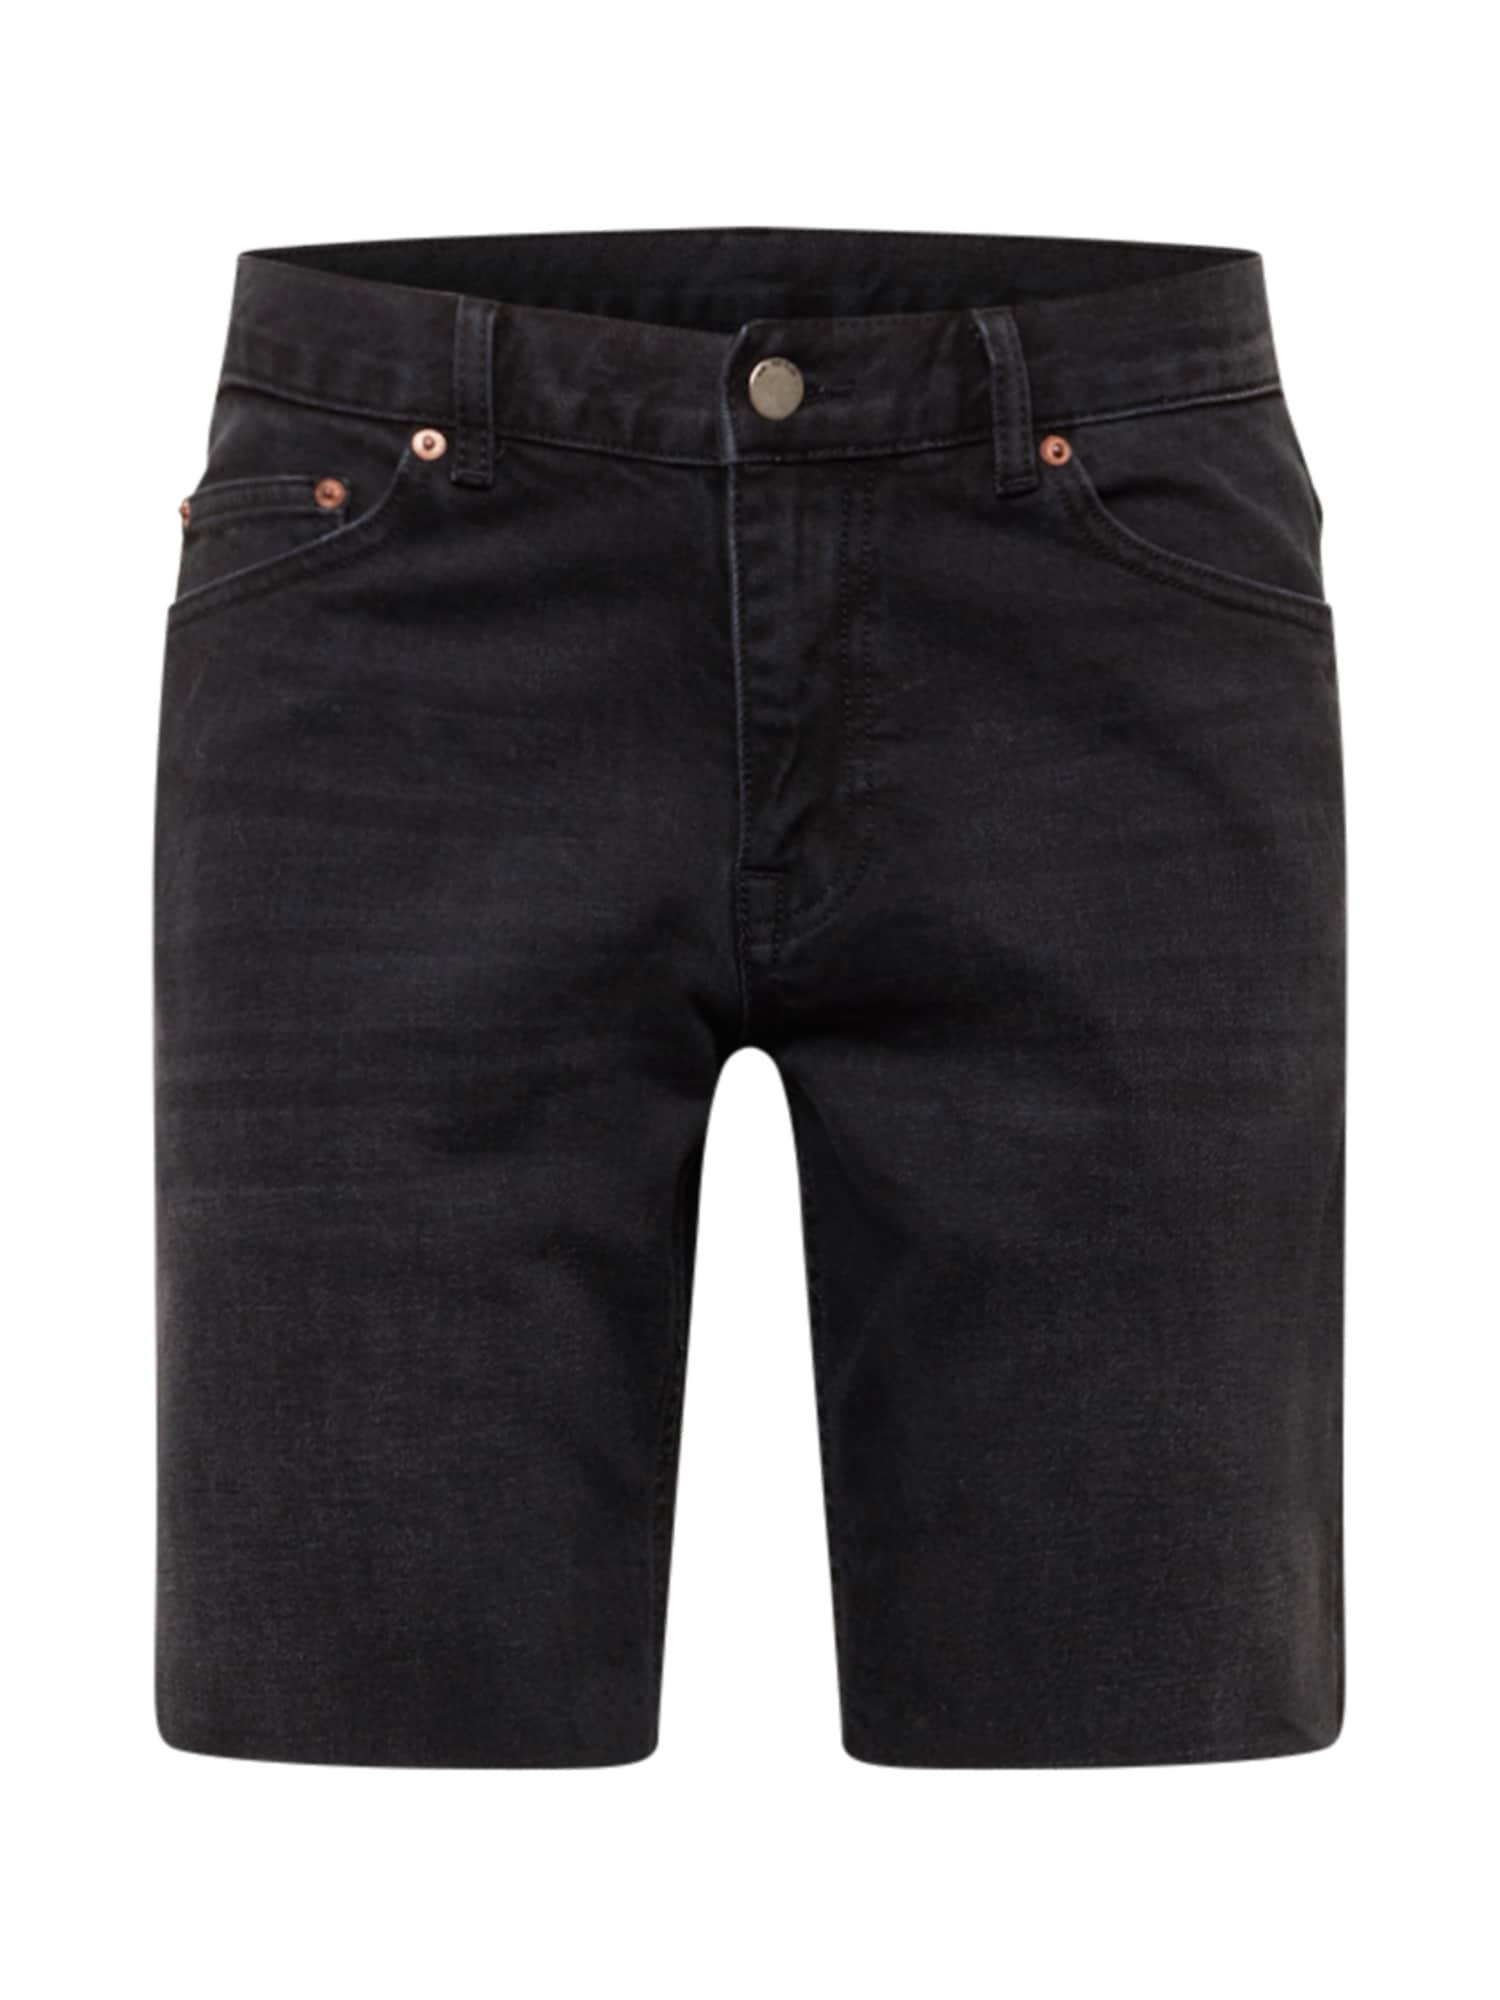 Dr. Denim Džinsai 'Clark' juodo džinso spalva